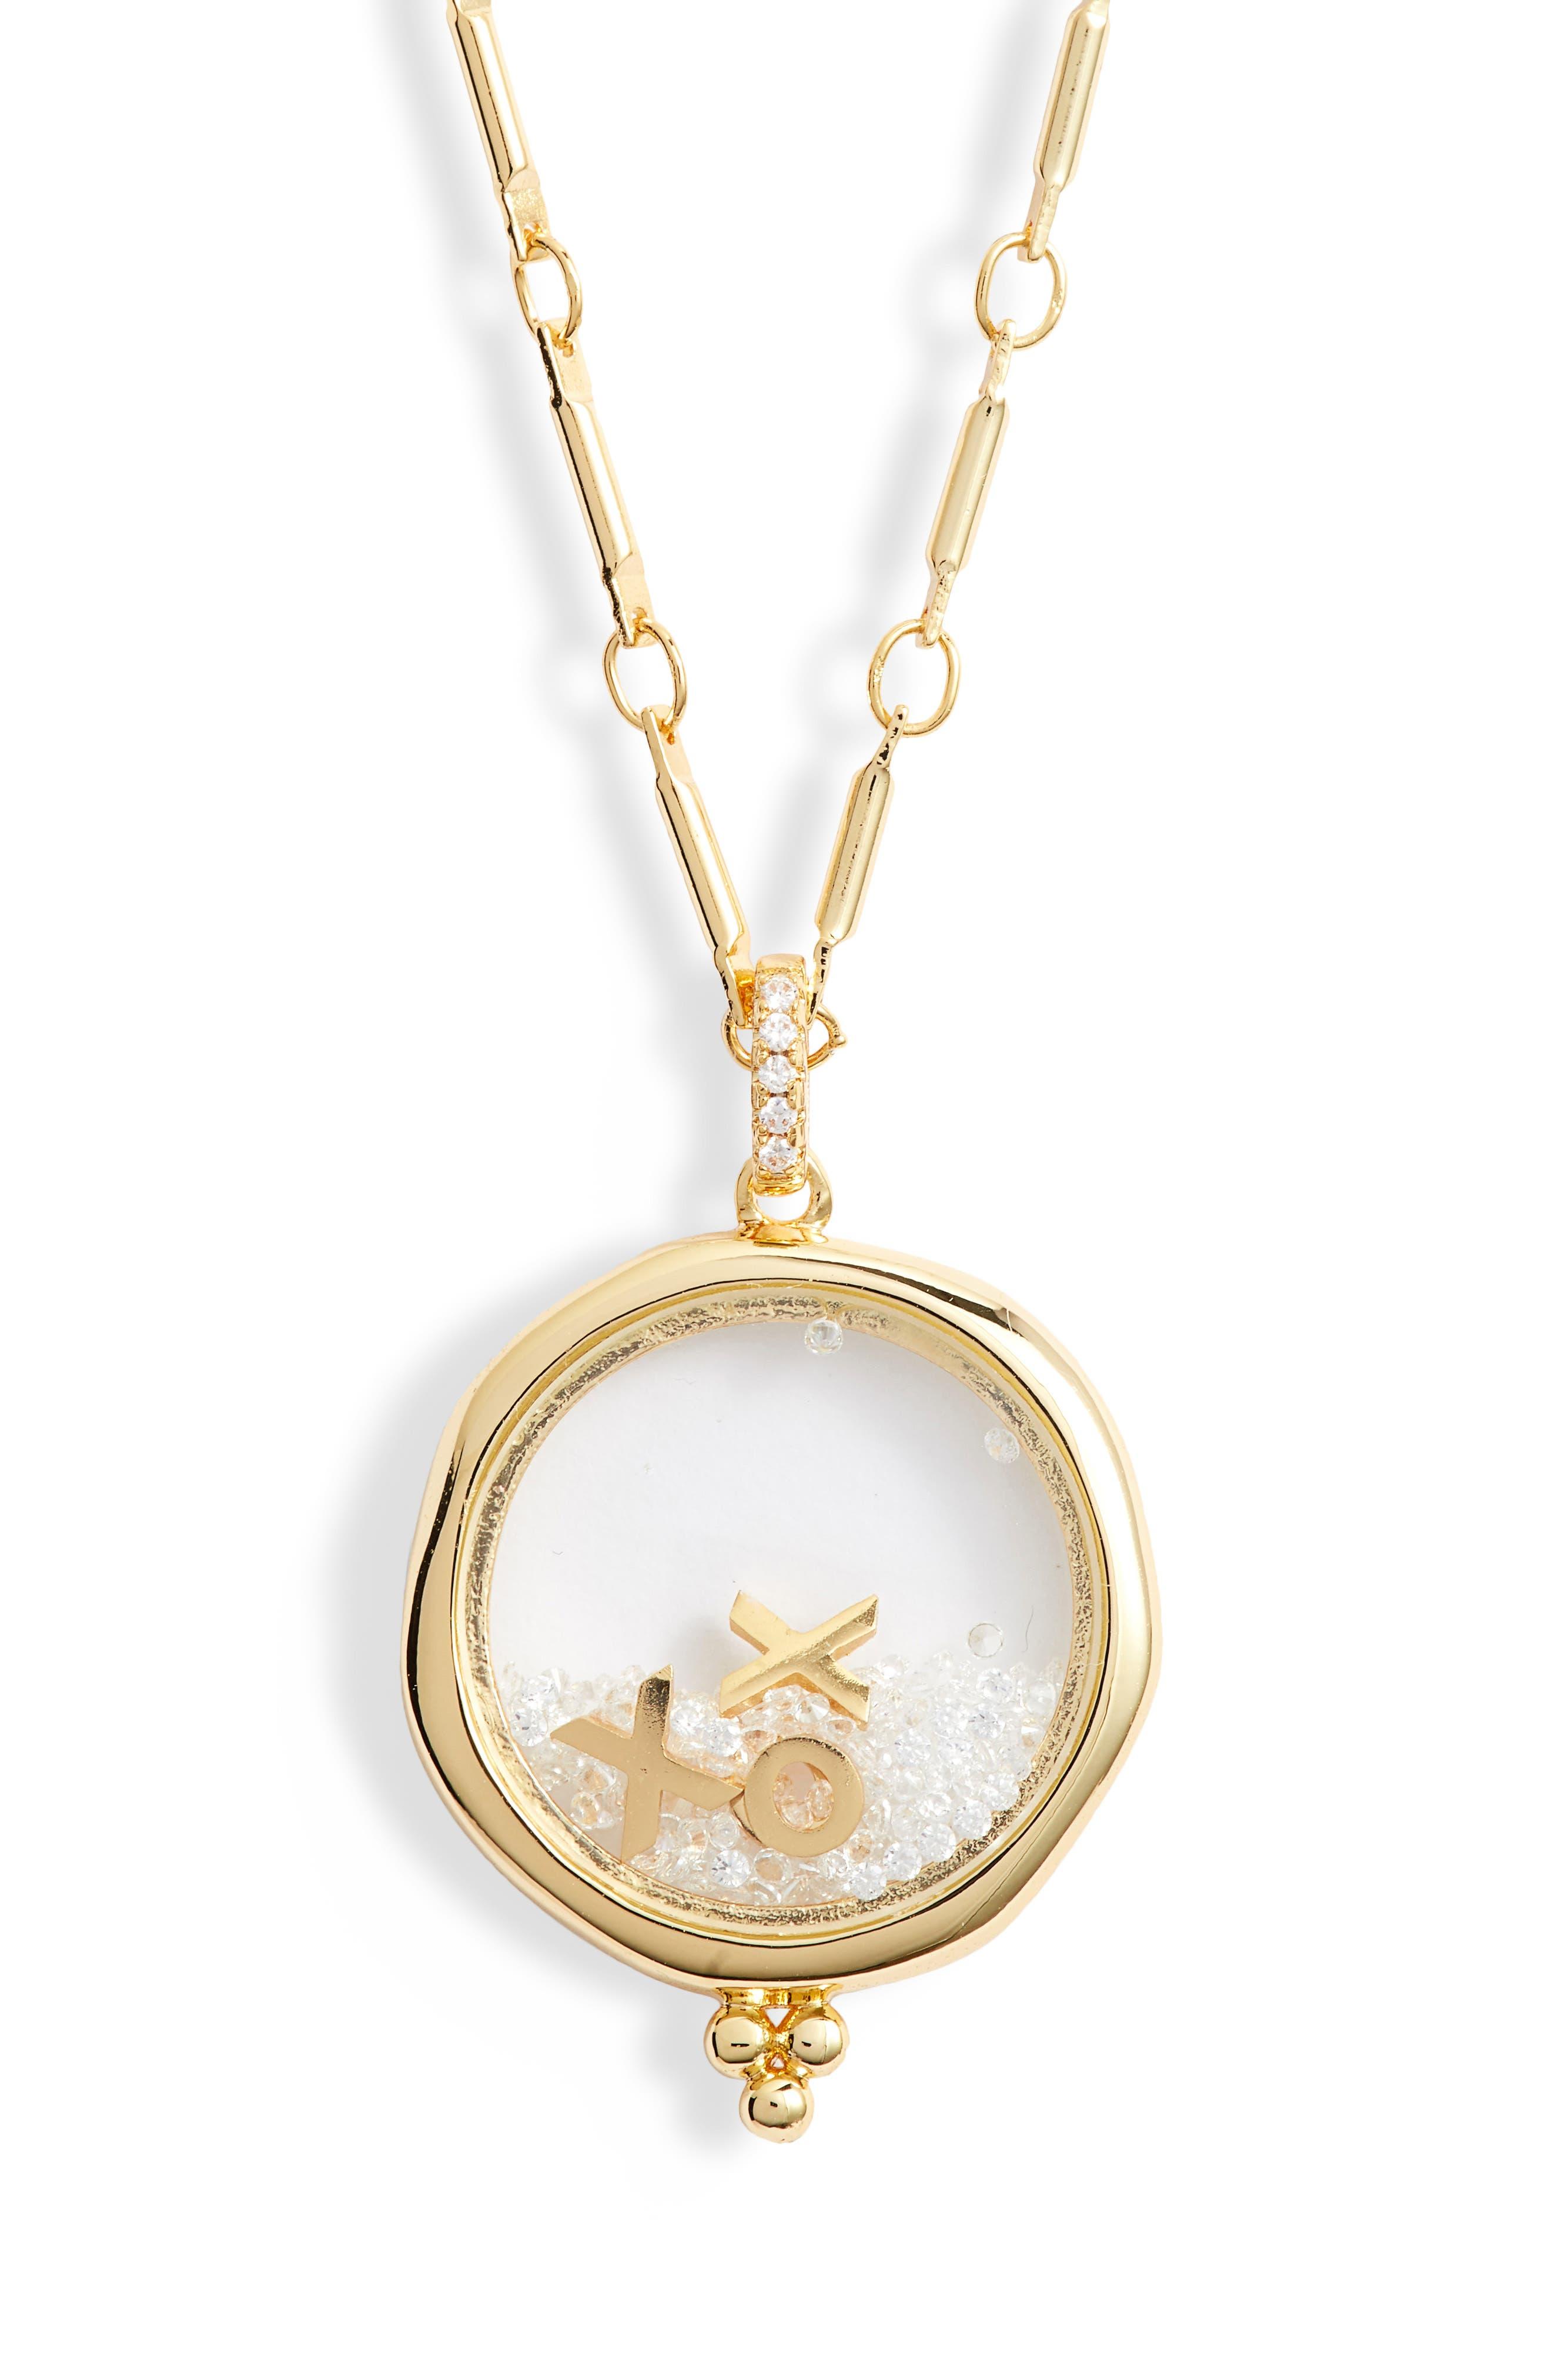 LULU DK X Kristina Schulman Xoxo Shaker Pendant Necklace in Gold